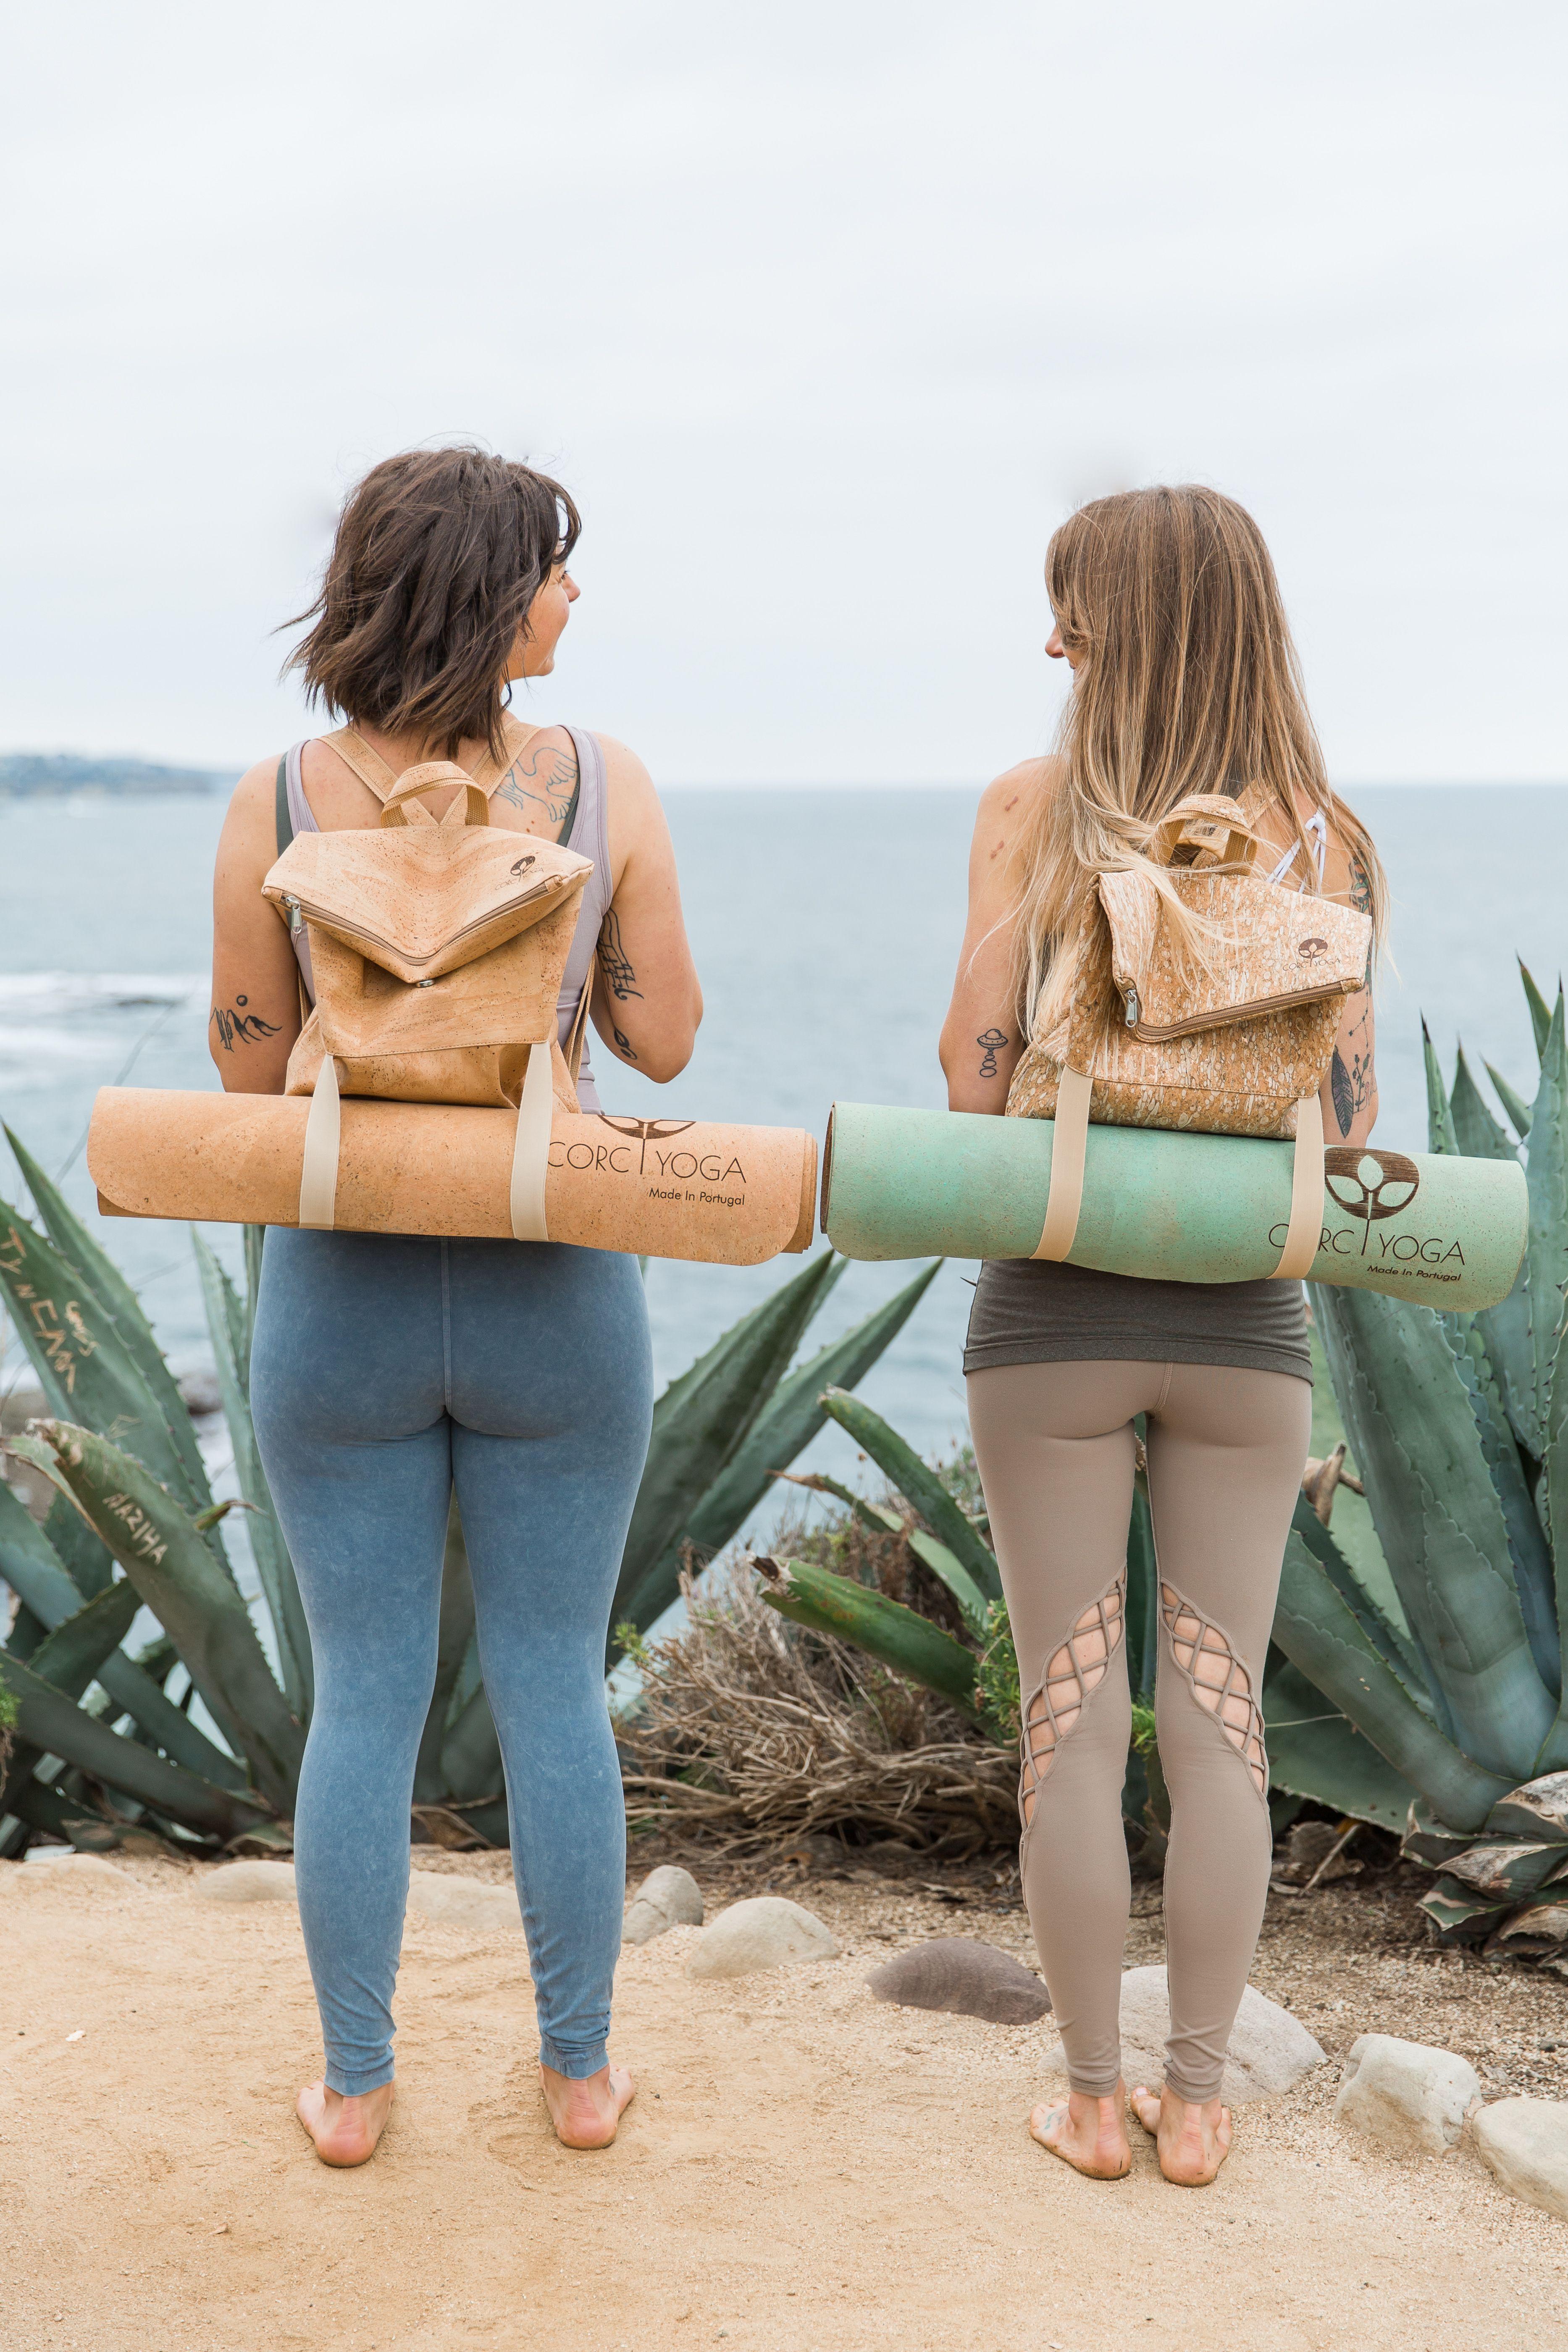 Corc Yoga | 100% Organic Yoga Mats & Yoga Accessories Made for Travel